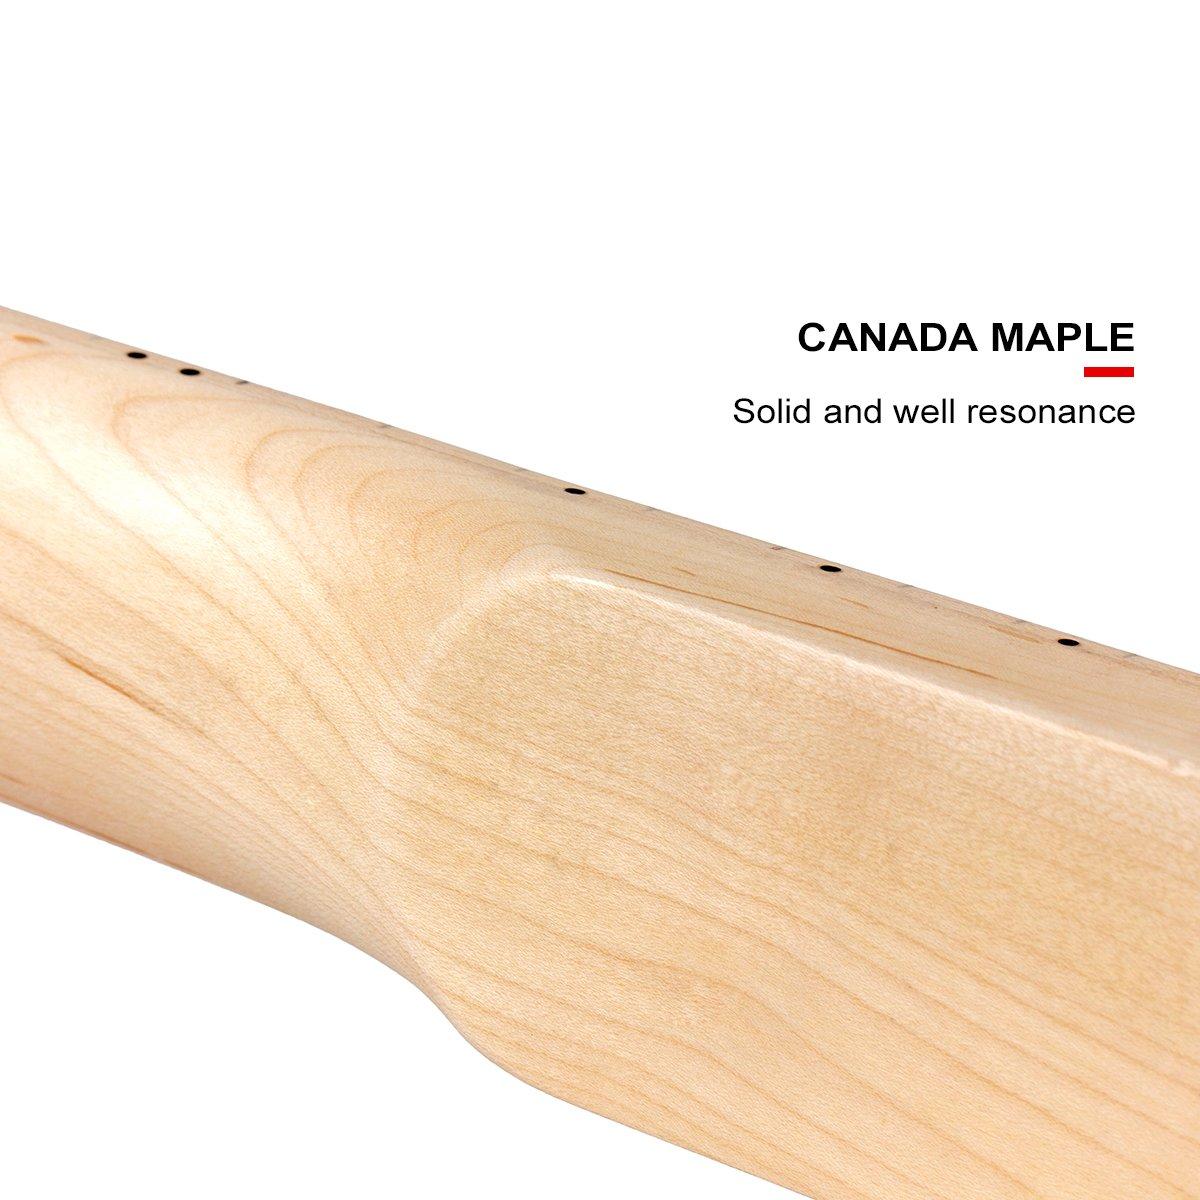 Kmise DIY Parts Clear Satin Maple 22 Fret Bolt on Paddle Headstock Electric Guitar Neck (4334250134) by Kmise (Image #7)